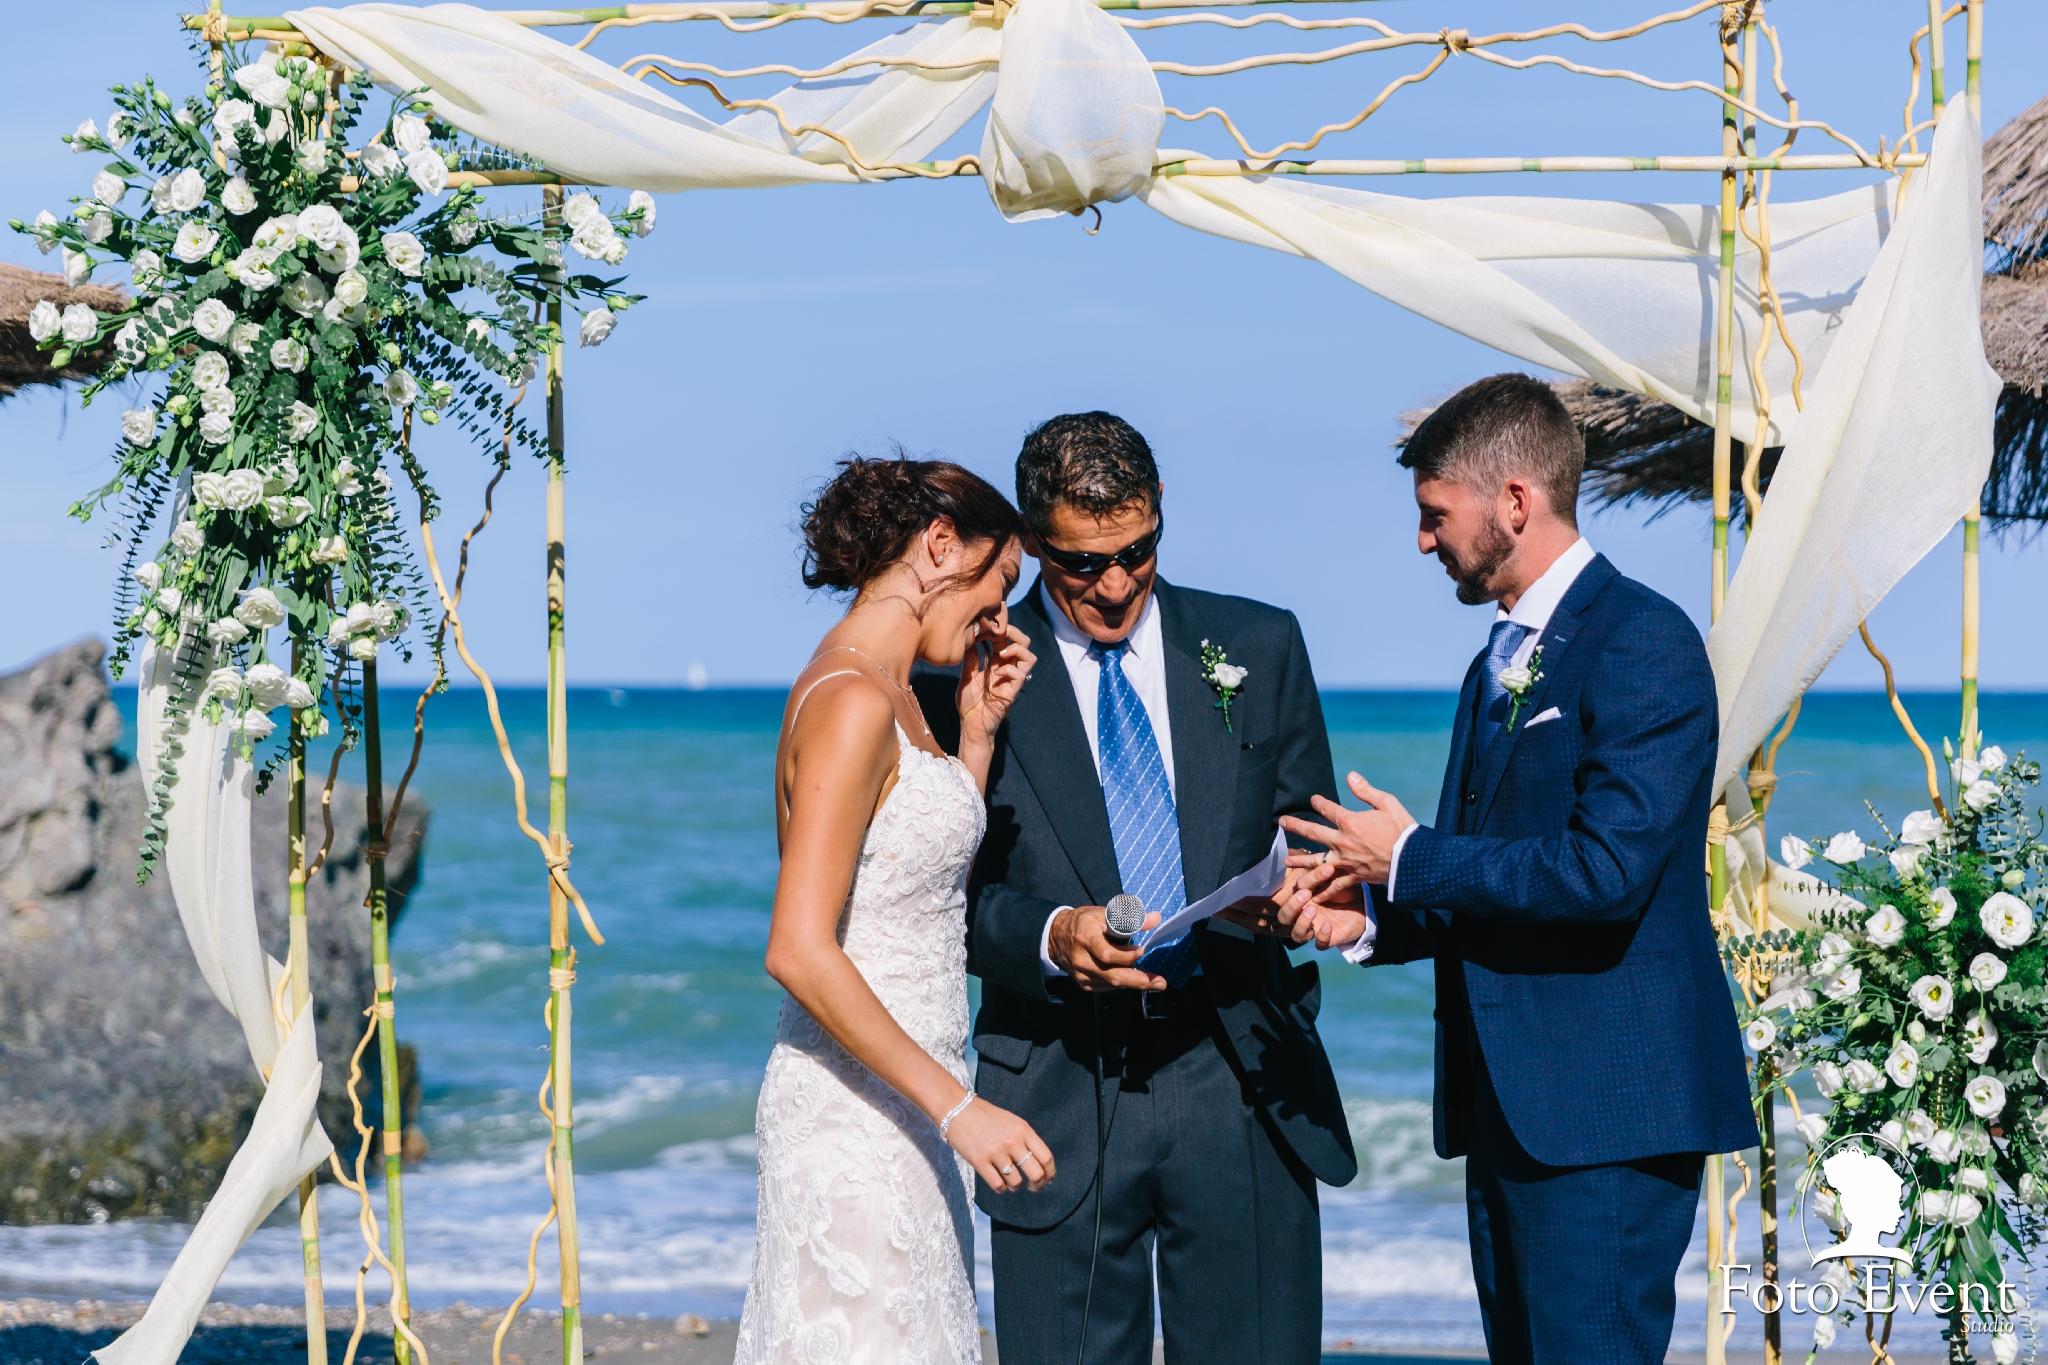 2018-09-25 Matrimonio Jessi e Simon Milligan 5DE 160